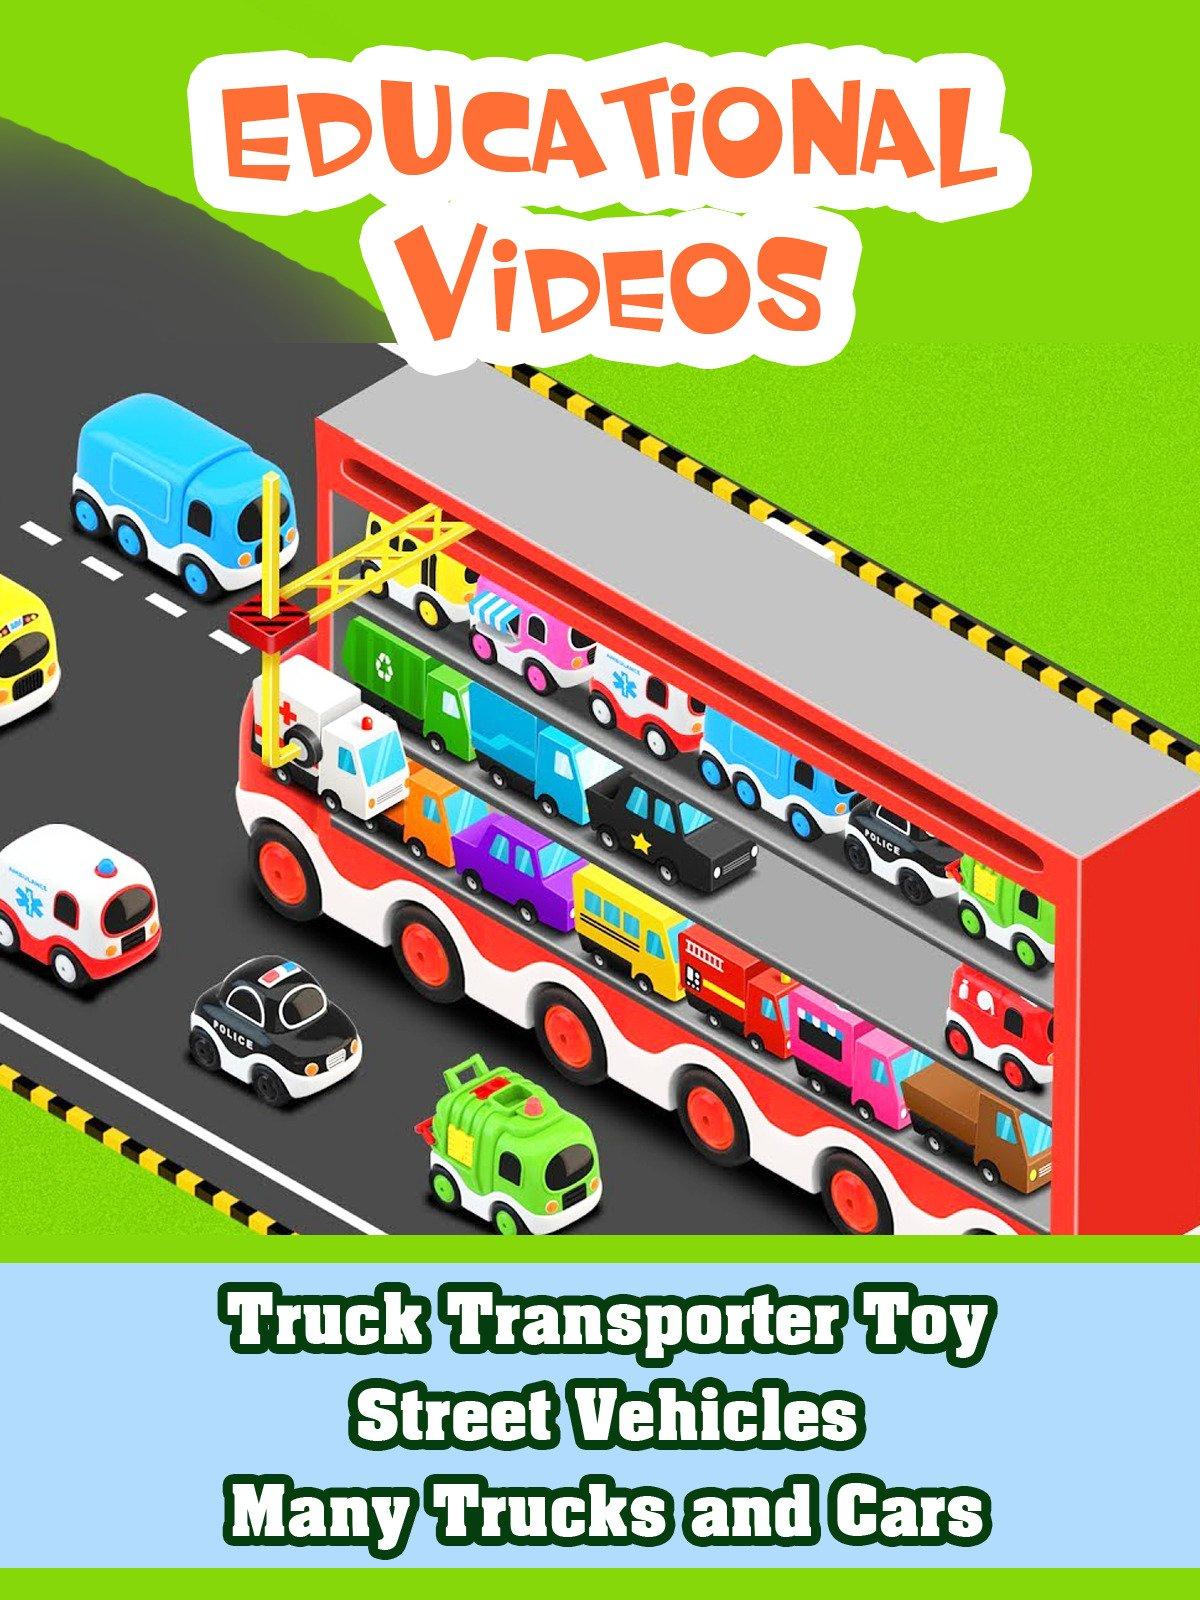 Truck Transporter Toy Street Vehicles